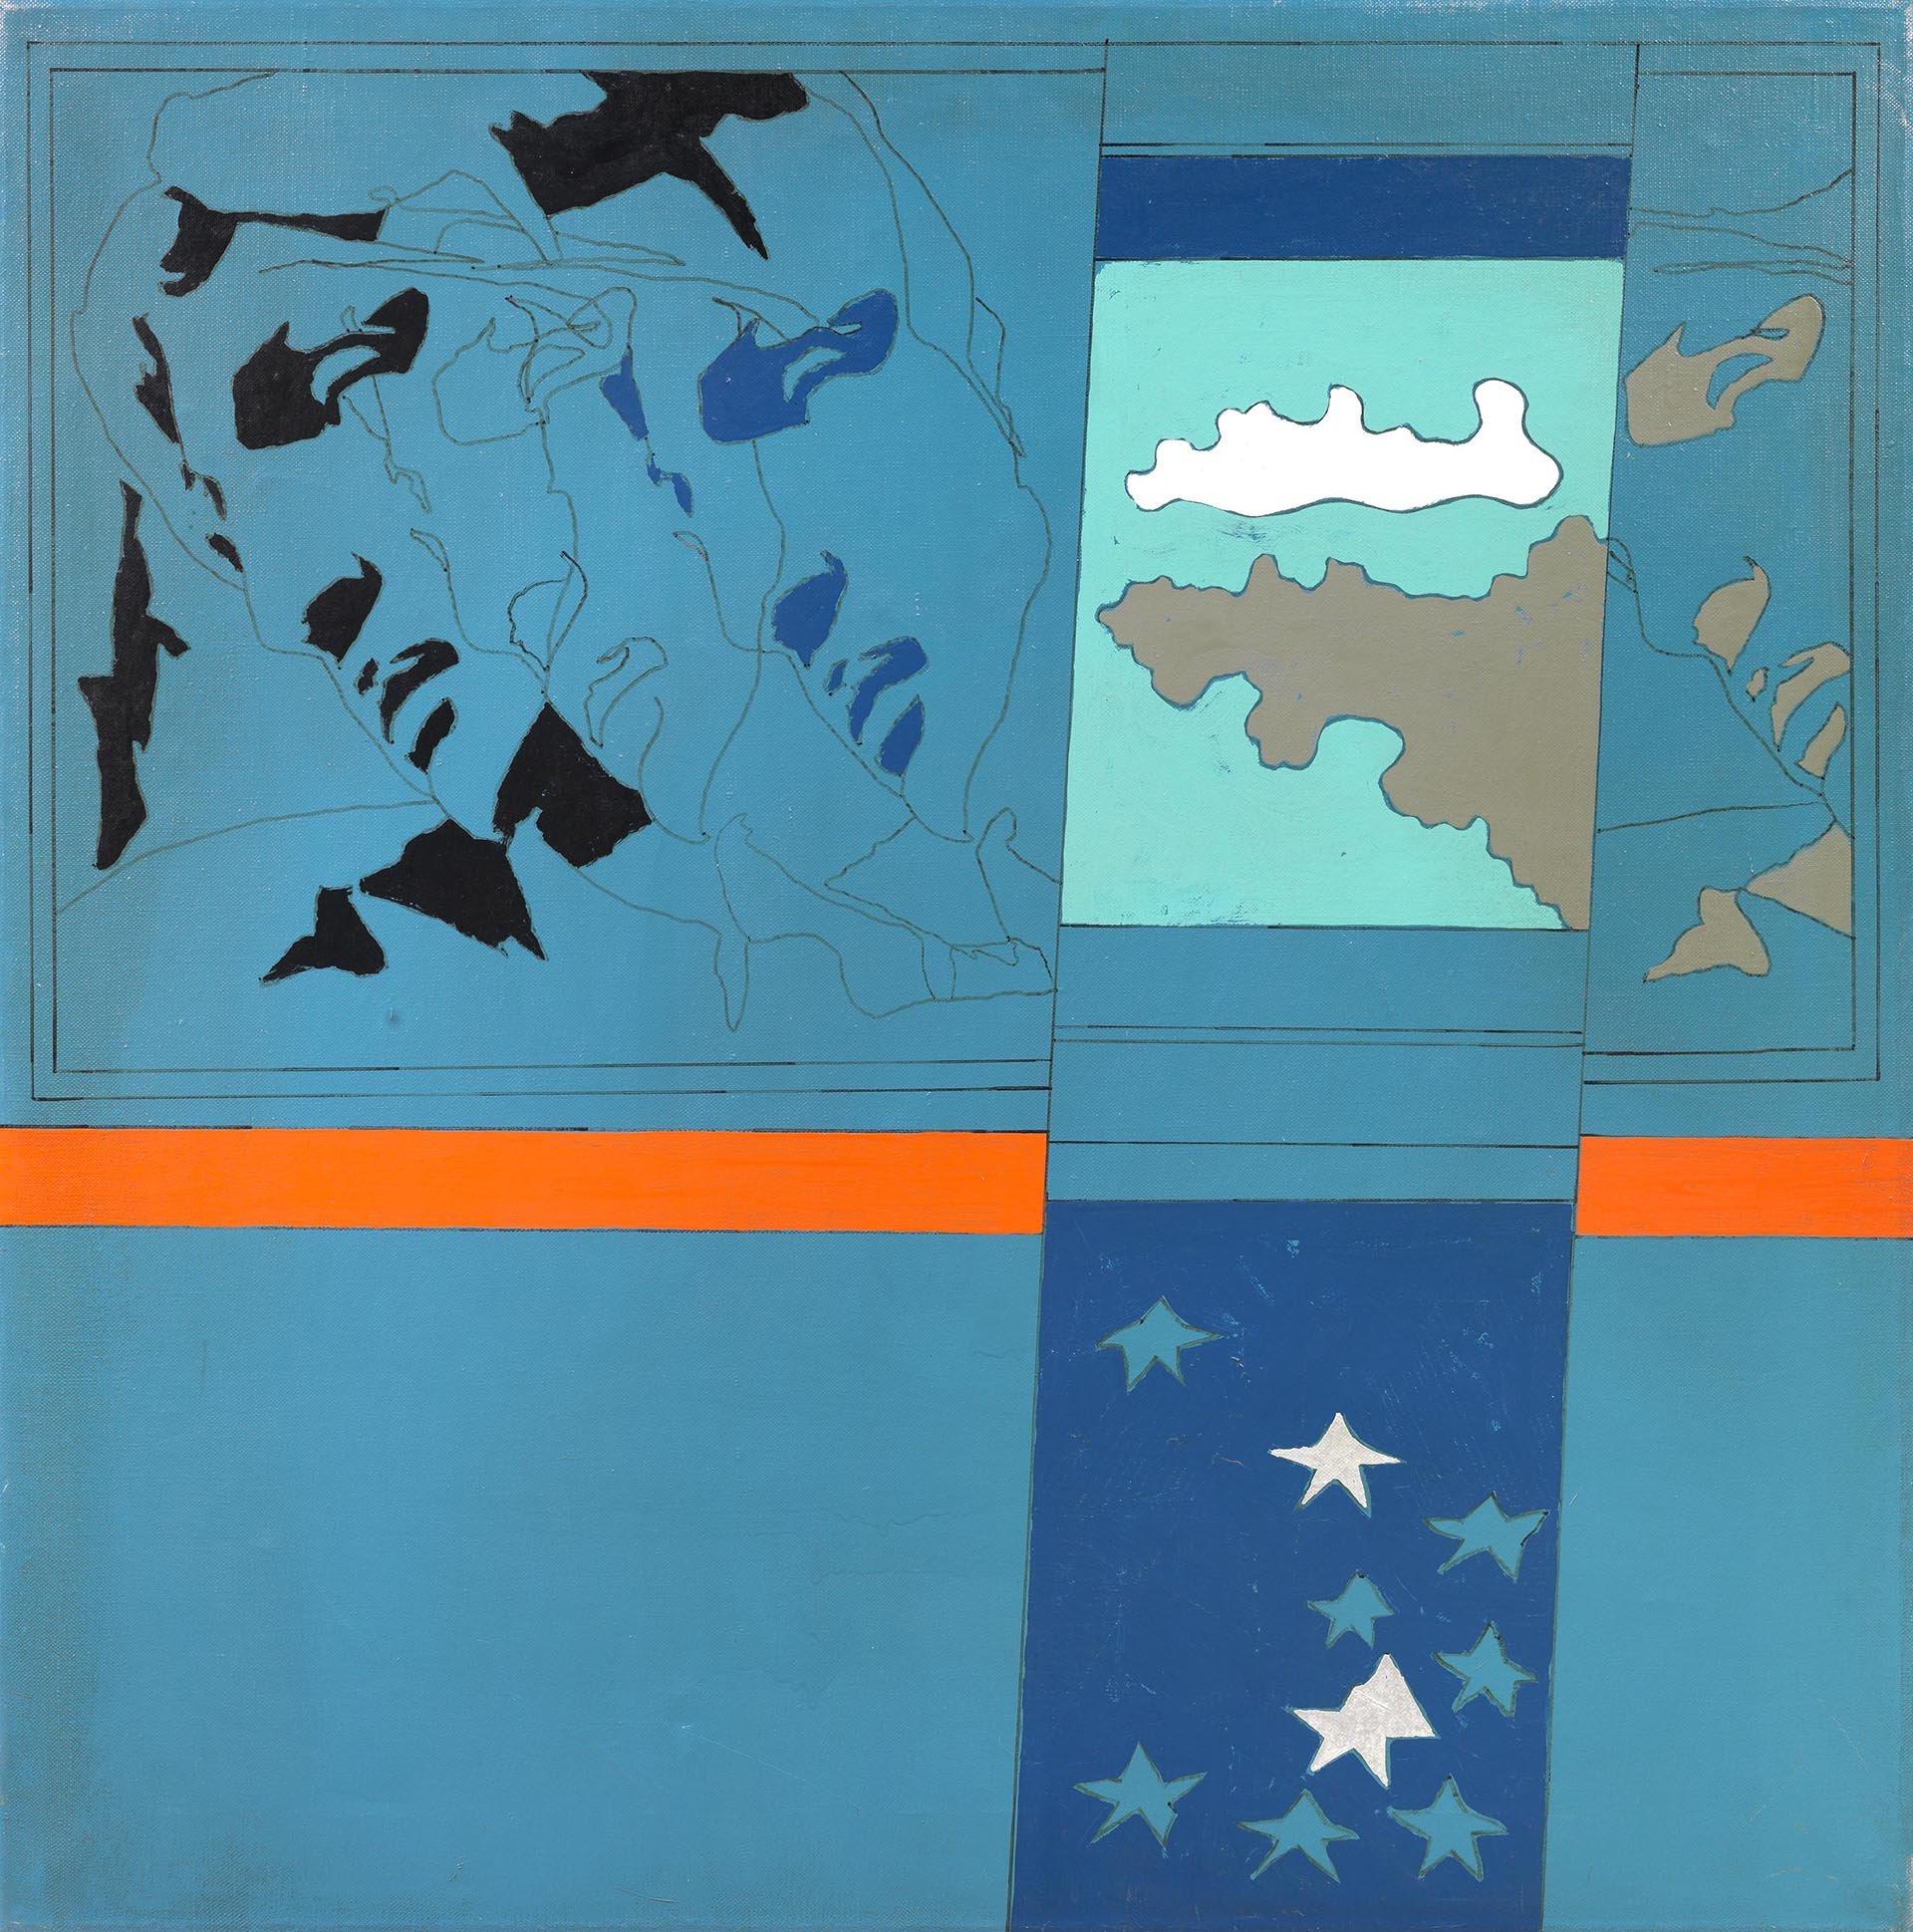 Festa_The-strike-of-the-stars-Michelangelo-according-to-Tano-Festa-n°-17_1967__92x91-cm